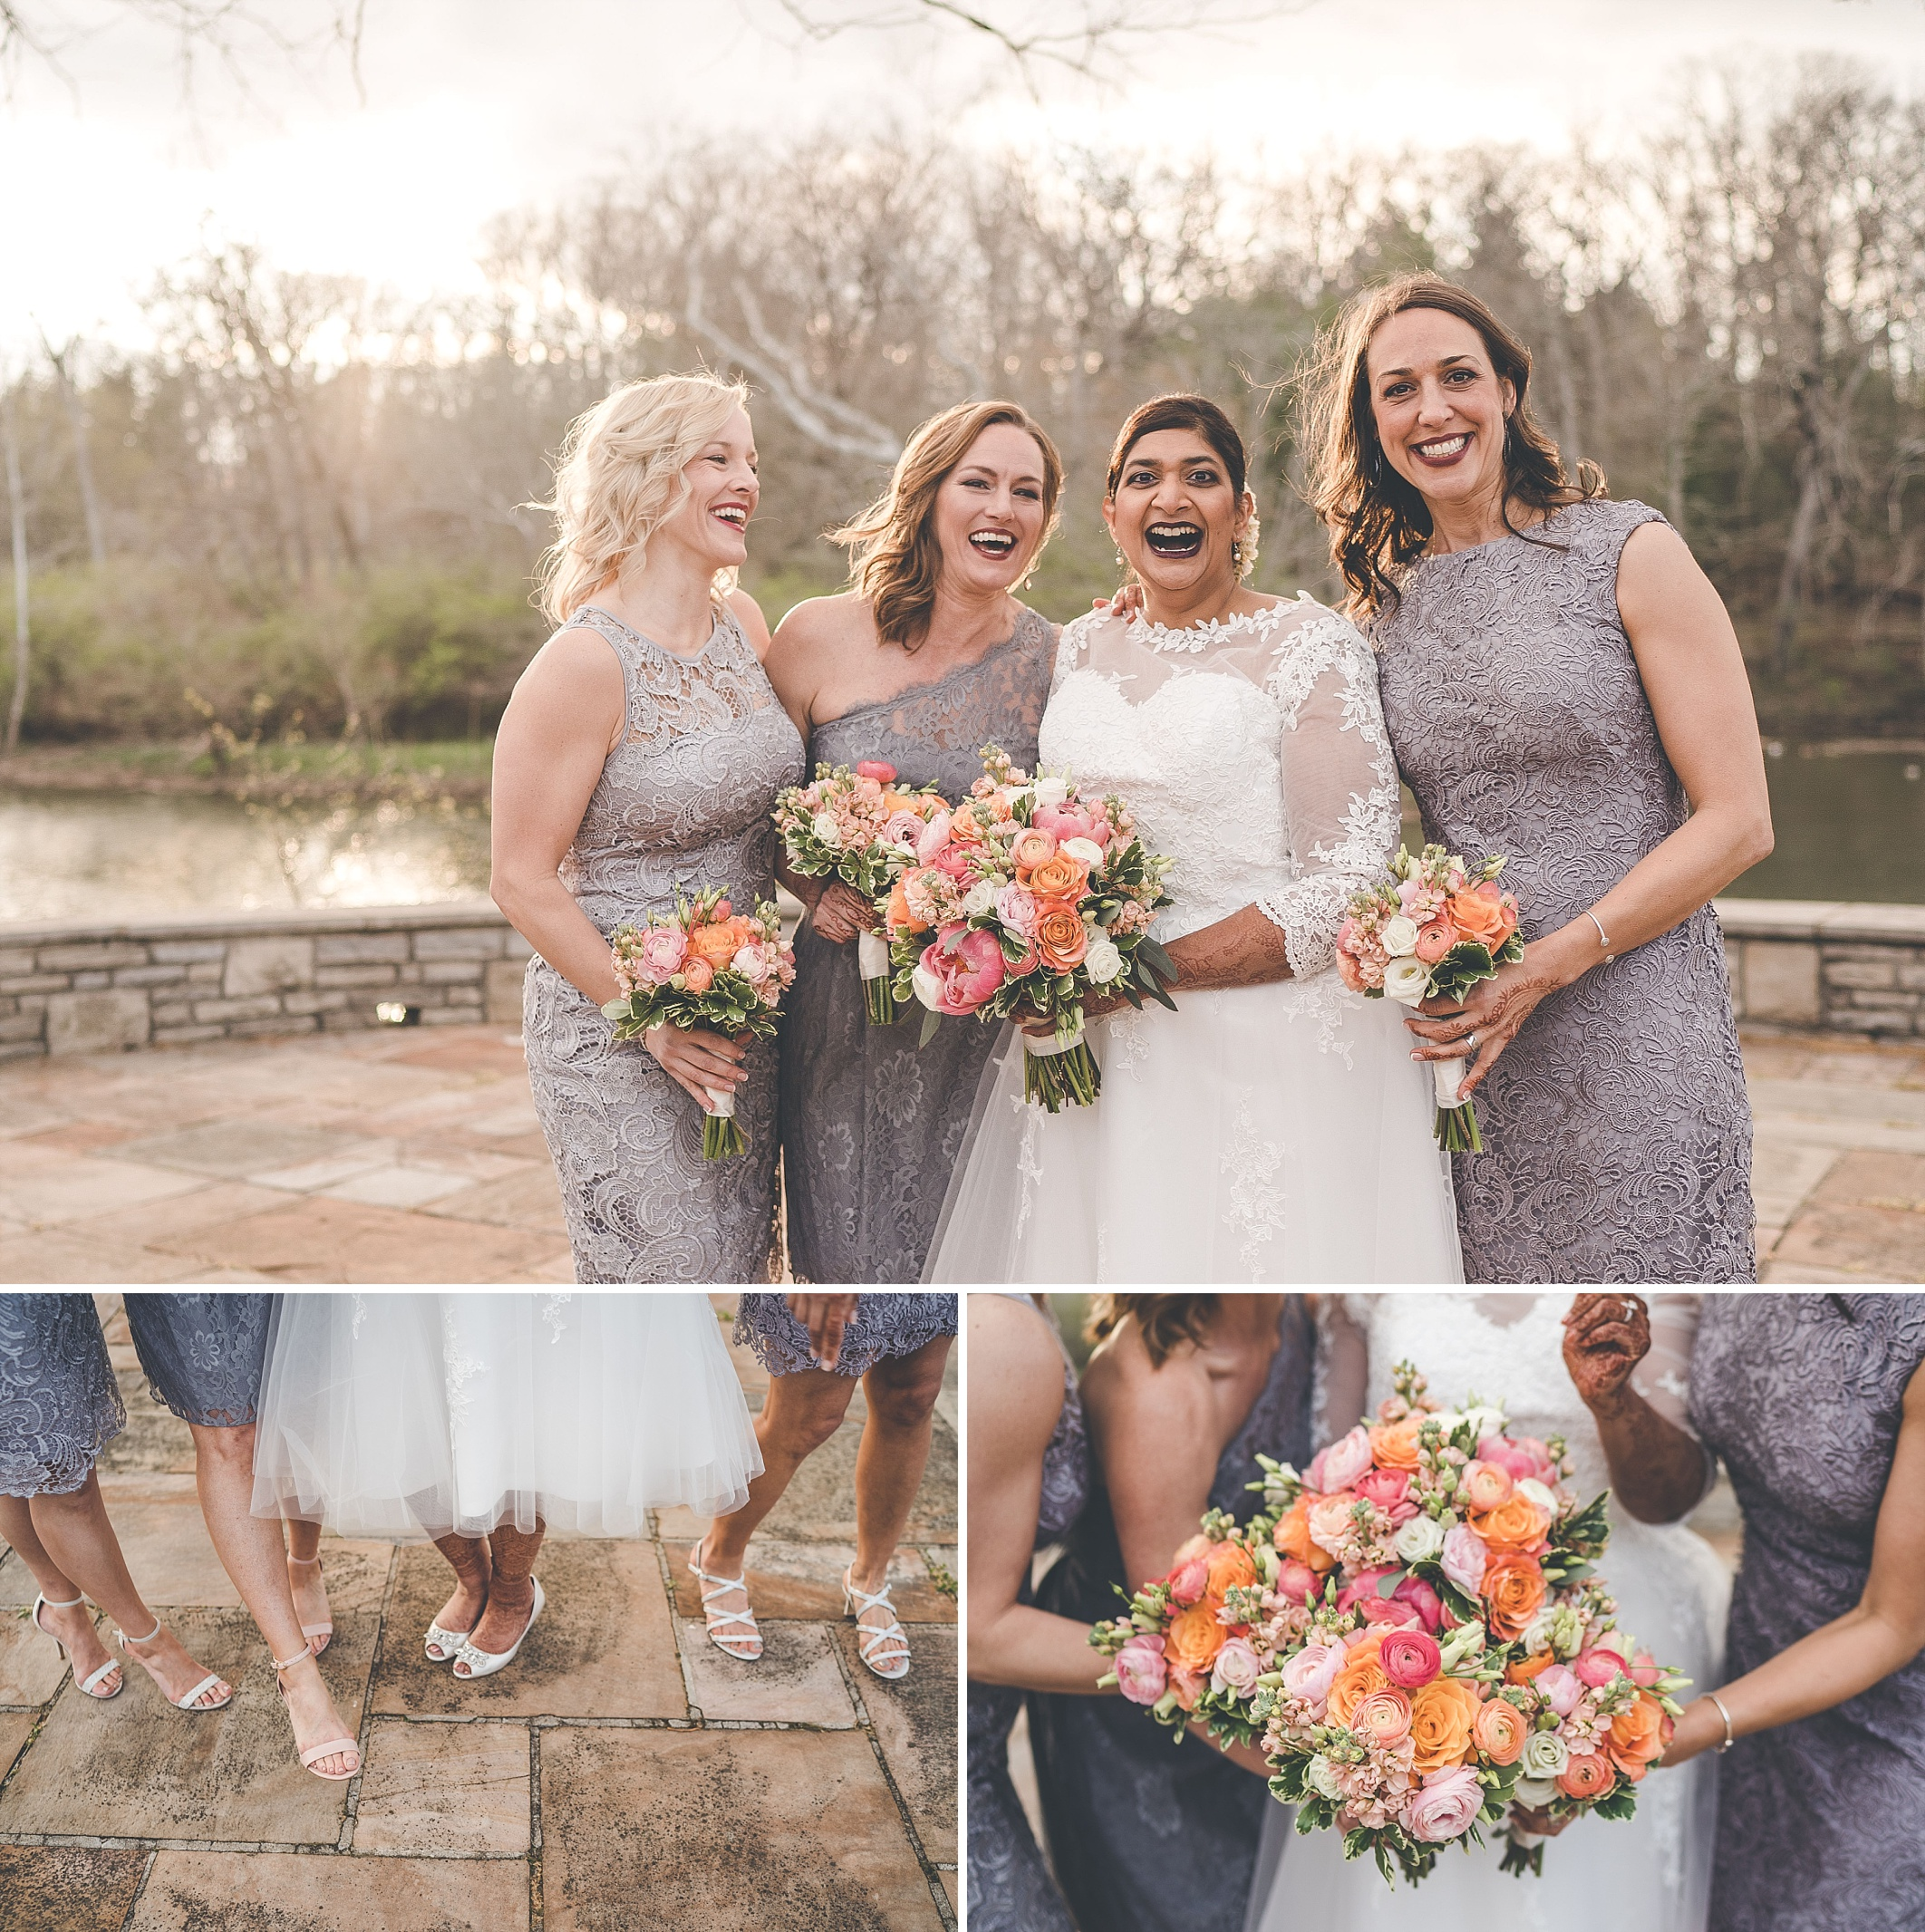 2712_dayton-indian-wedding-photographer-beavercreek_0067.jpg